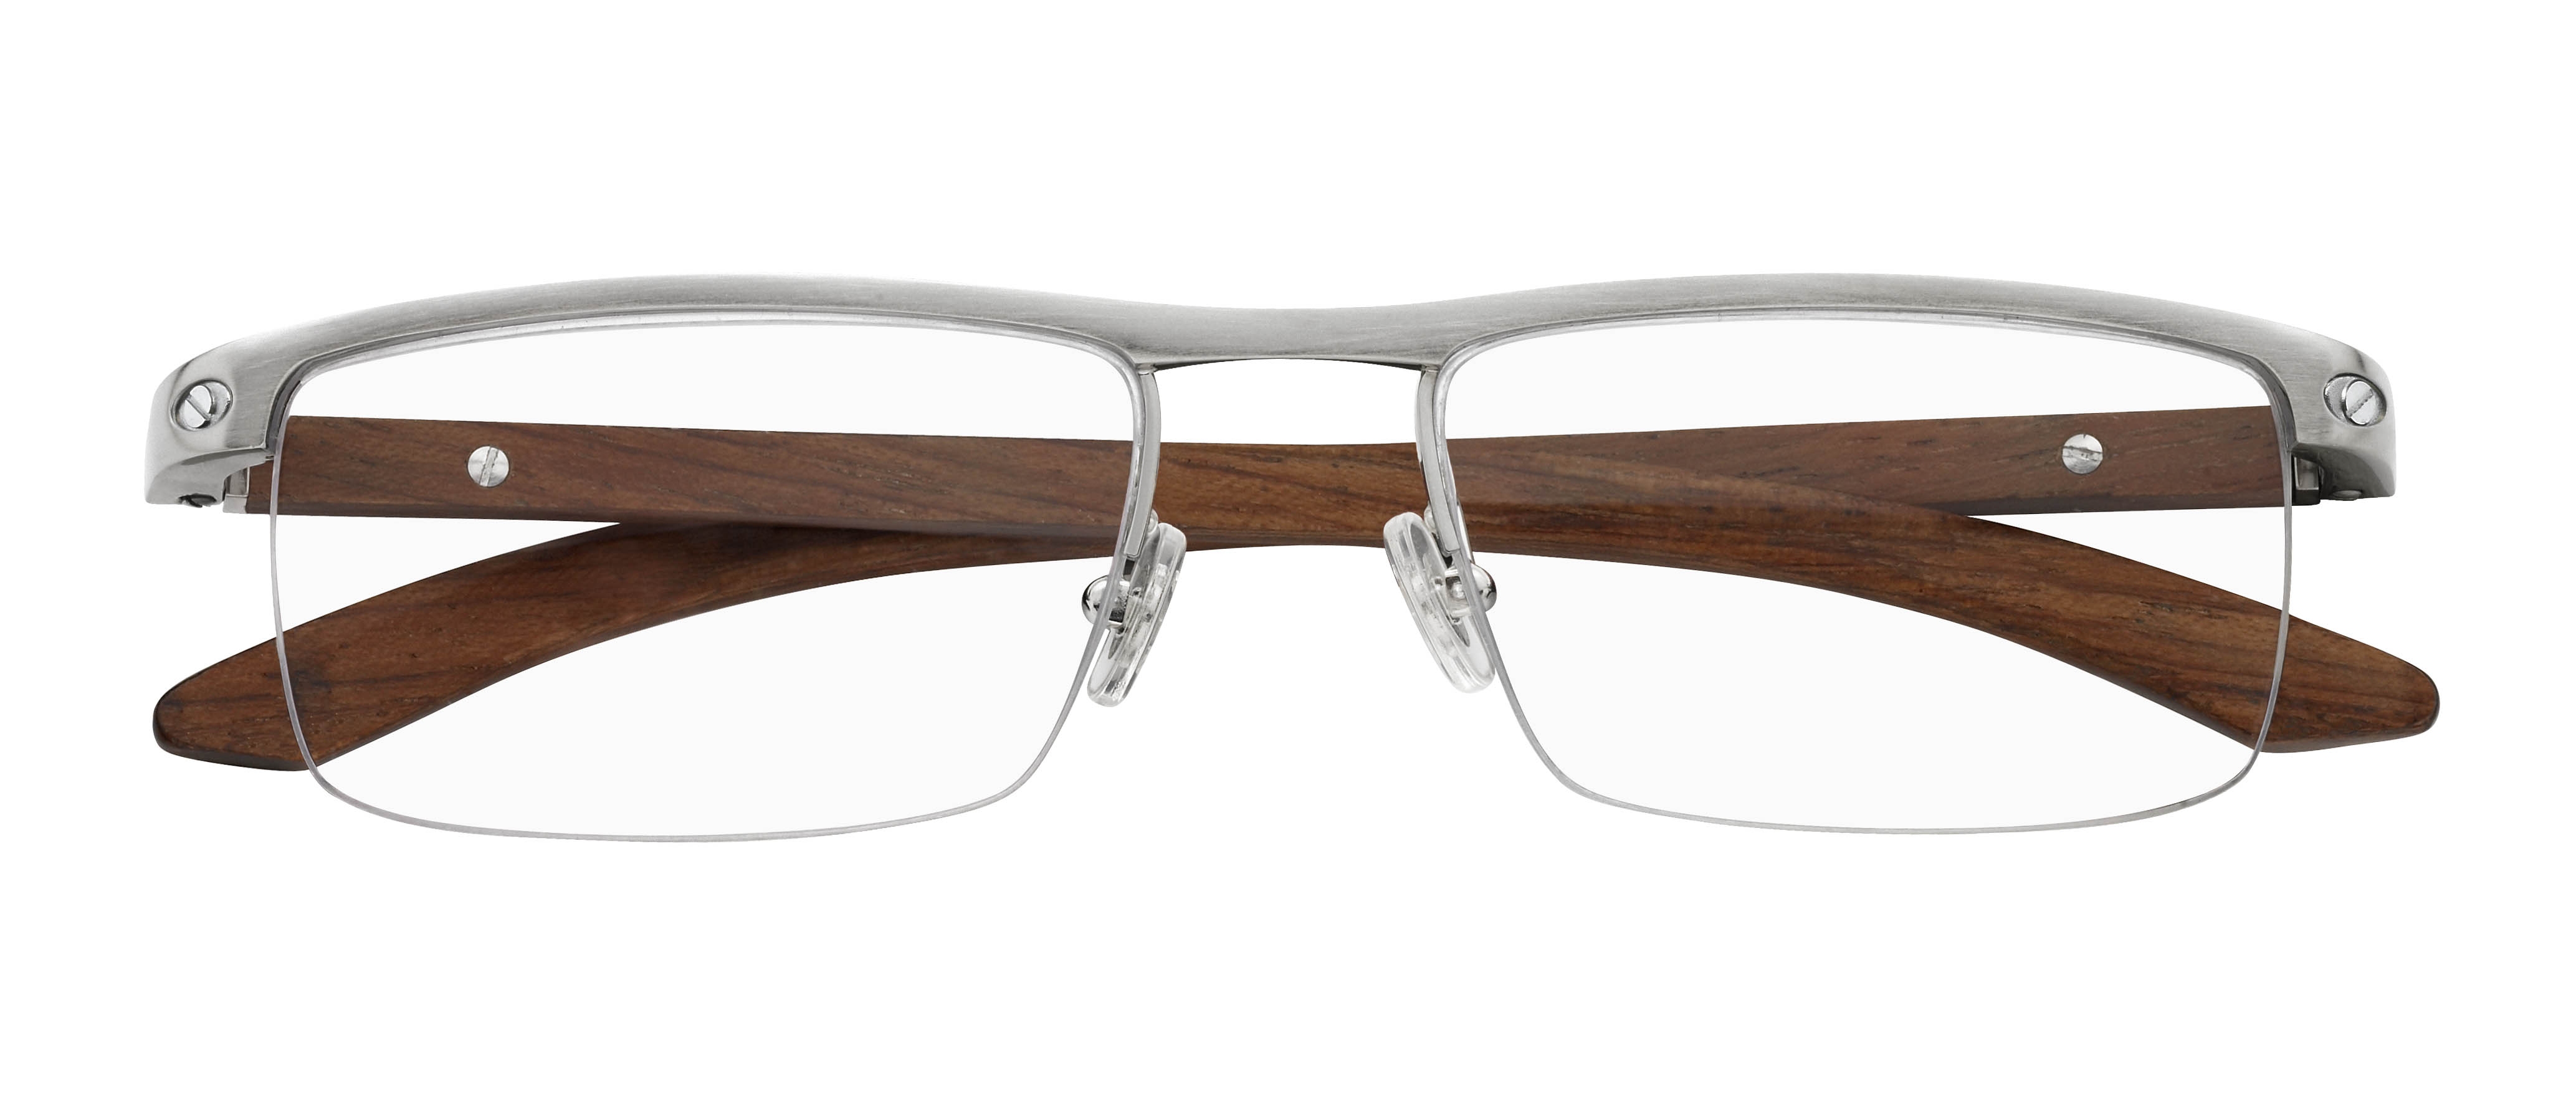 Cartier Glasses | Barnard Levit